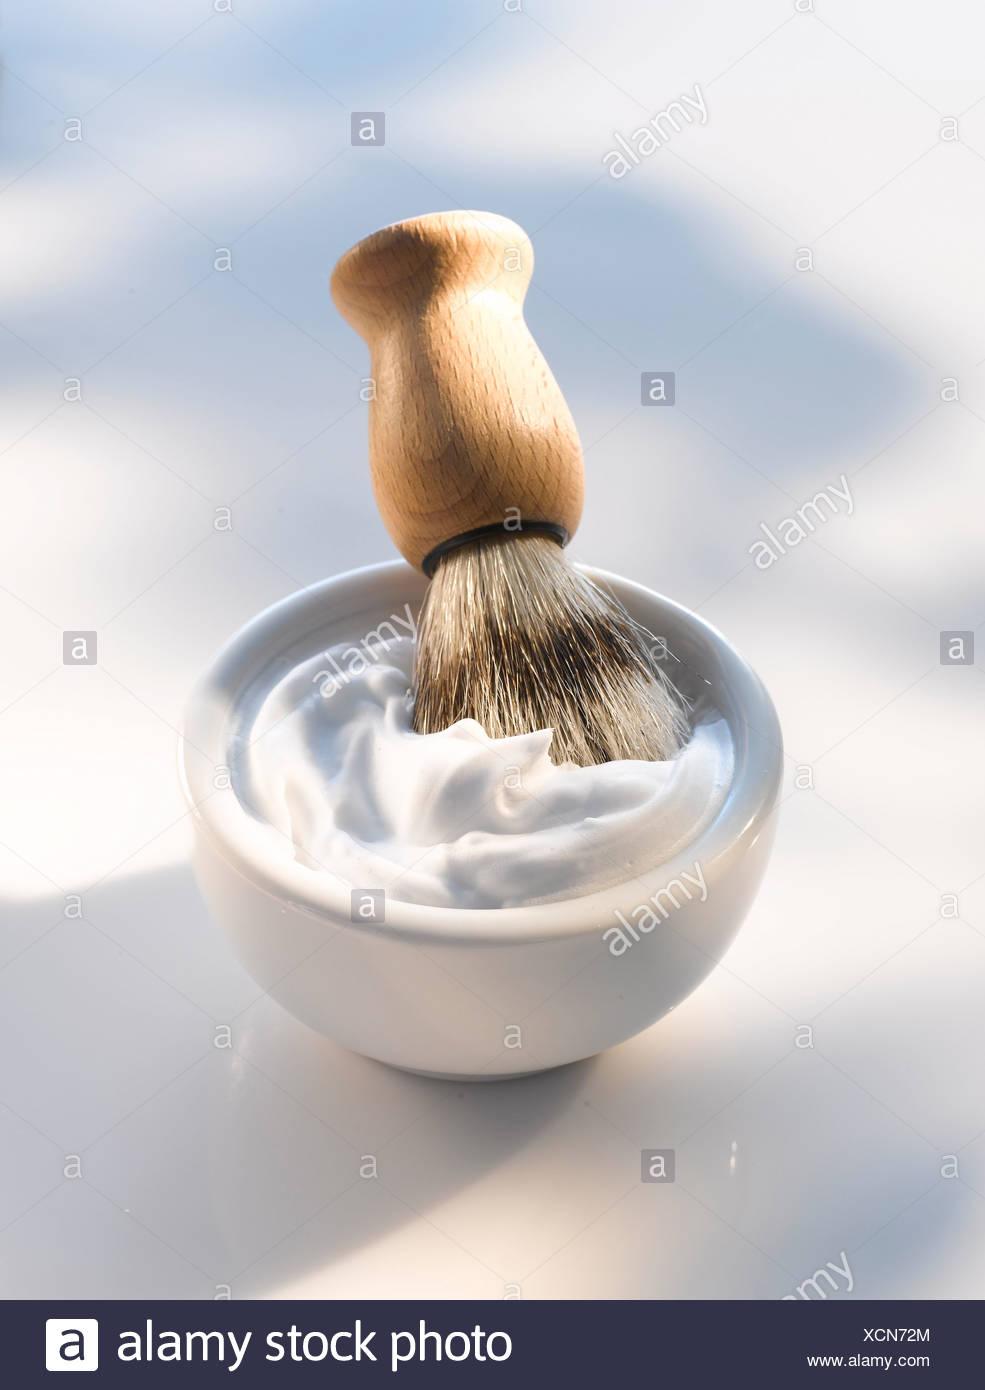 Shaving brush, shaving foam, close up - Stock Image